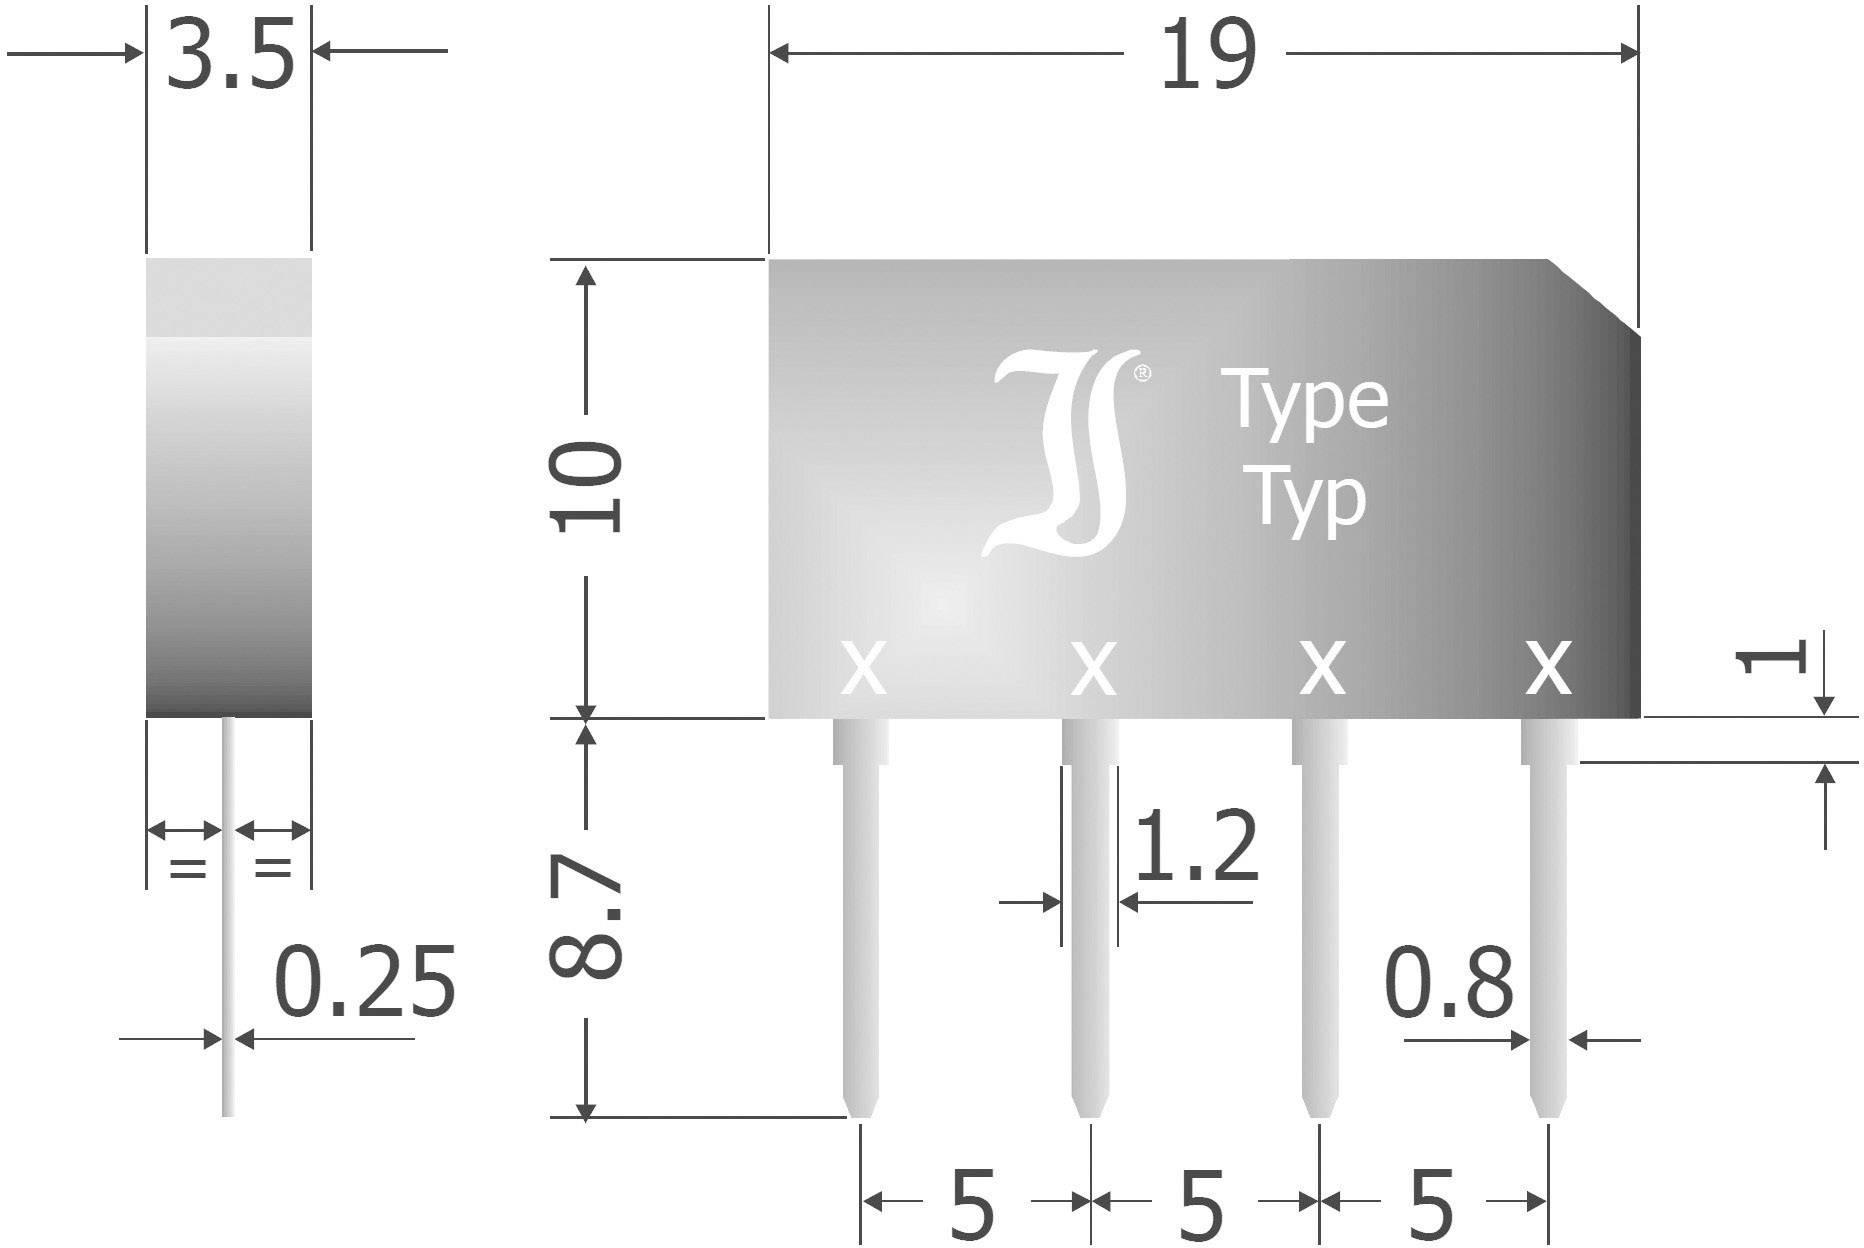 Křemíkový můstkový usměrňovač Diotec B80C2300-1500B, U(RRM) 160 V, 1,5 A, SIL